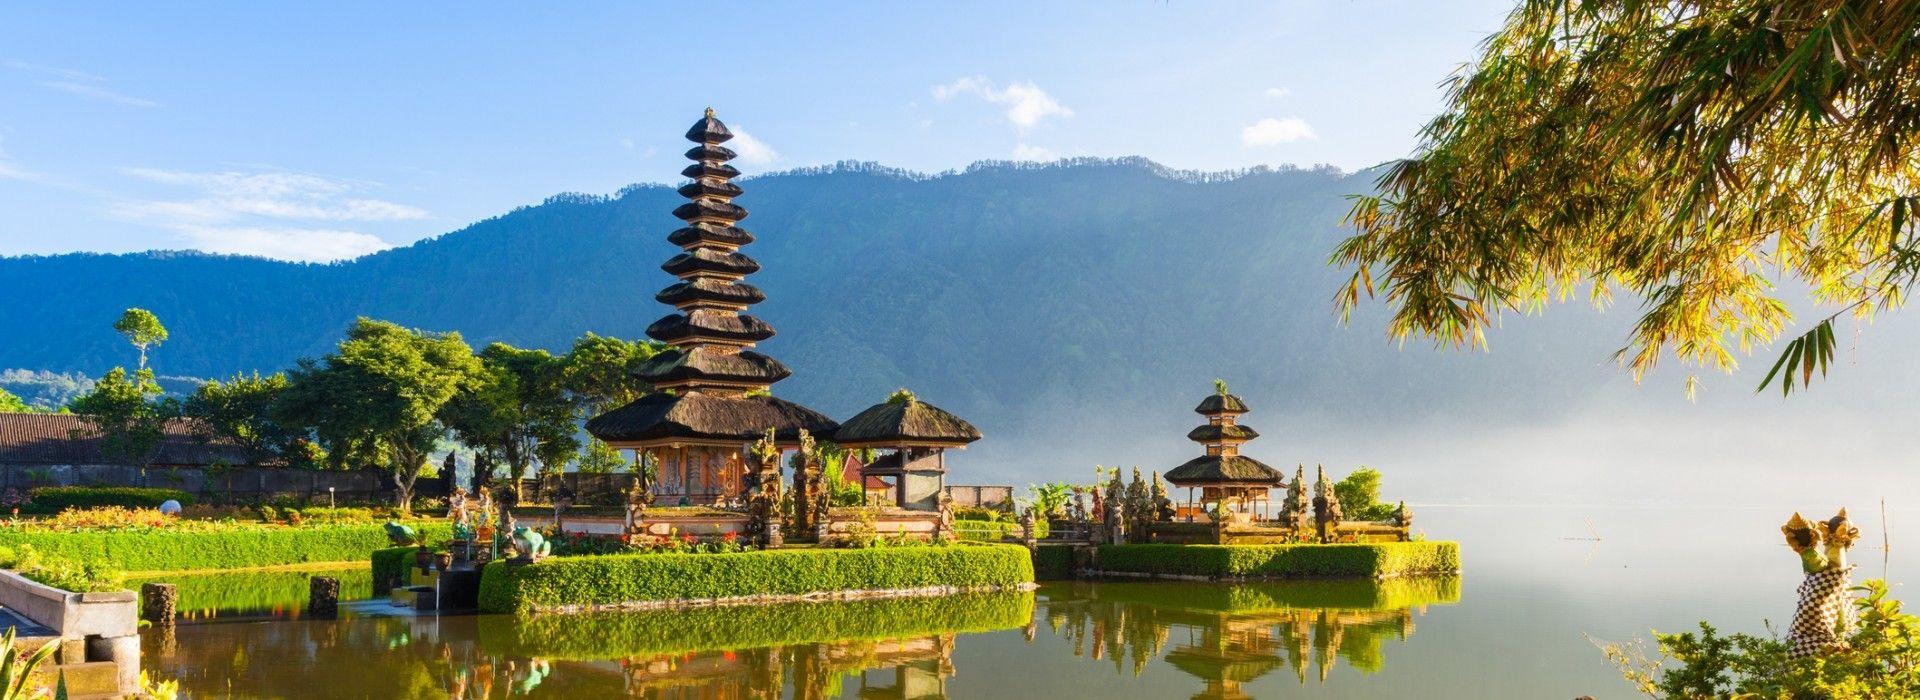 Train tours in Bali